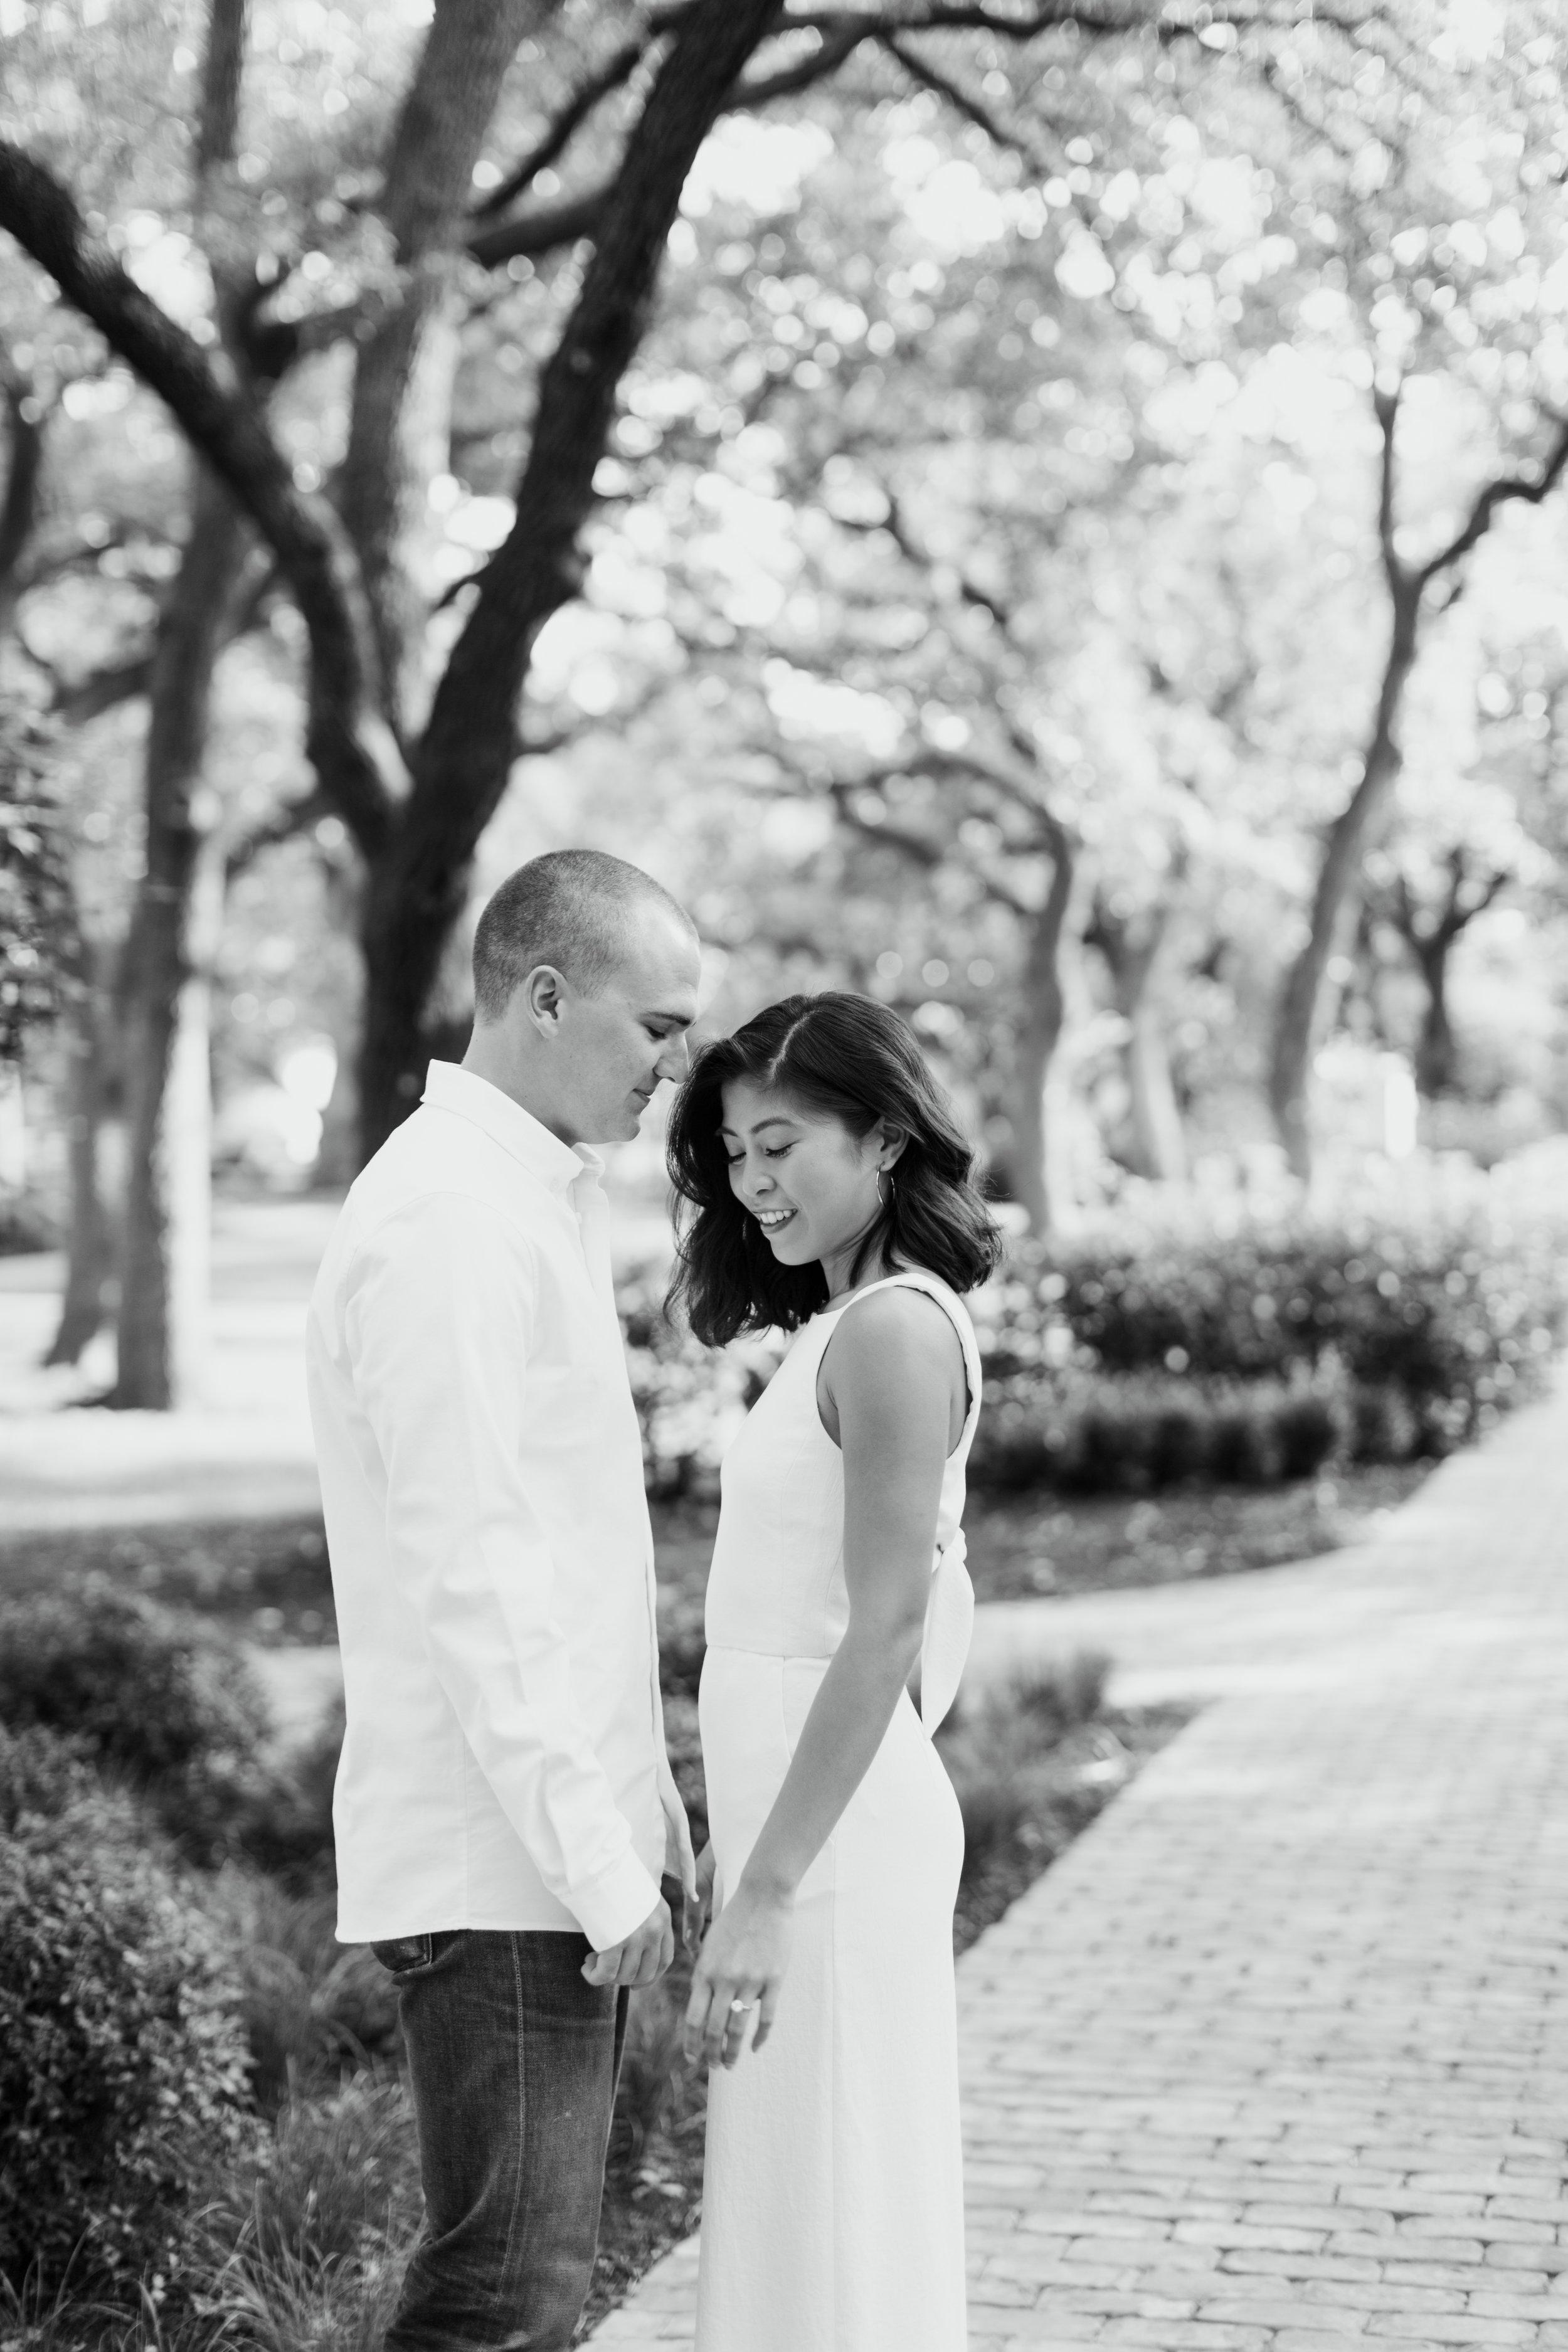 Paige-Newton-Photography-Engagement-Session-Austin-Manana-Coffee-Matties0009.jpg